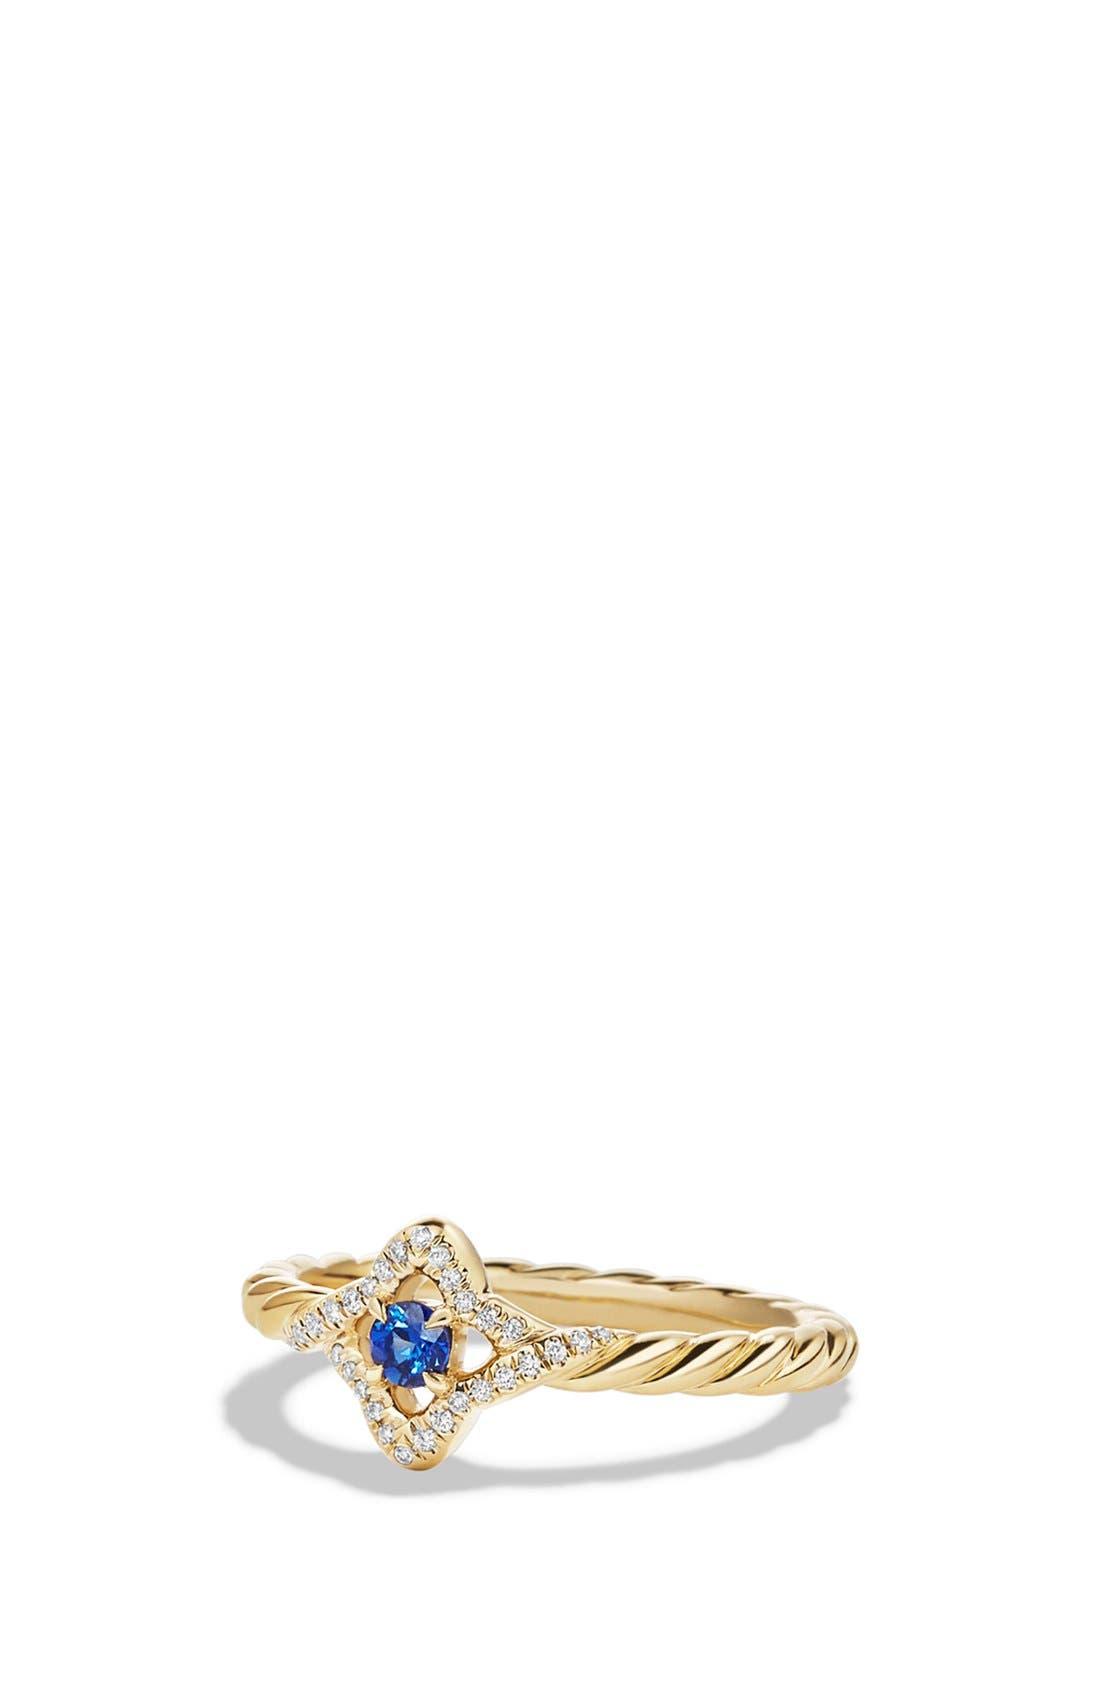 'Venetial Quatrefoil' Ring in Gold,                         Main,                         color, BLUE SAPPHIRE